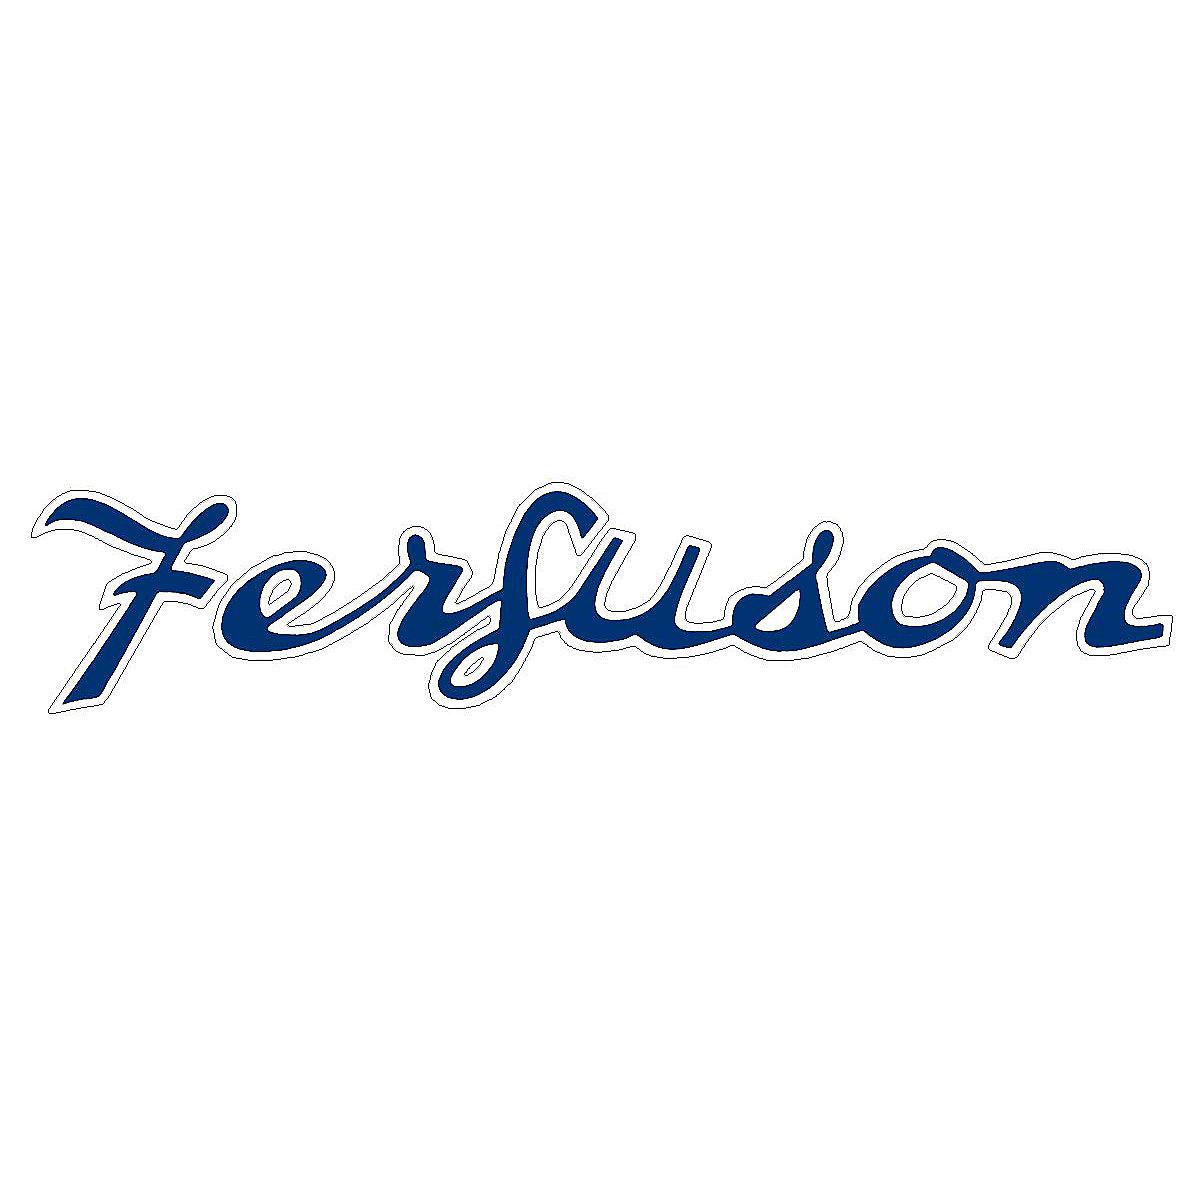 Ferguson Tractor Decals : John deere tractor engine free image for